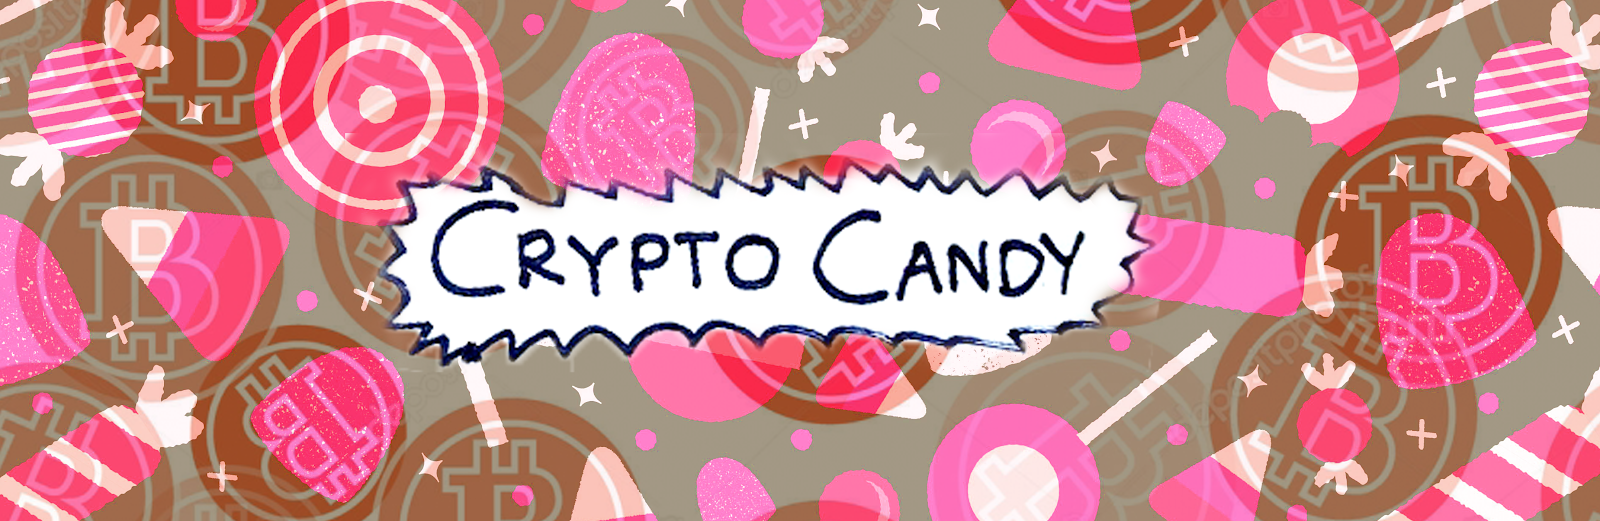 Crypto candy kids bakery